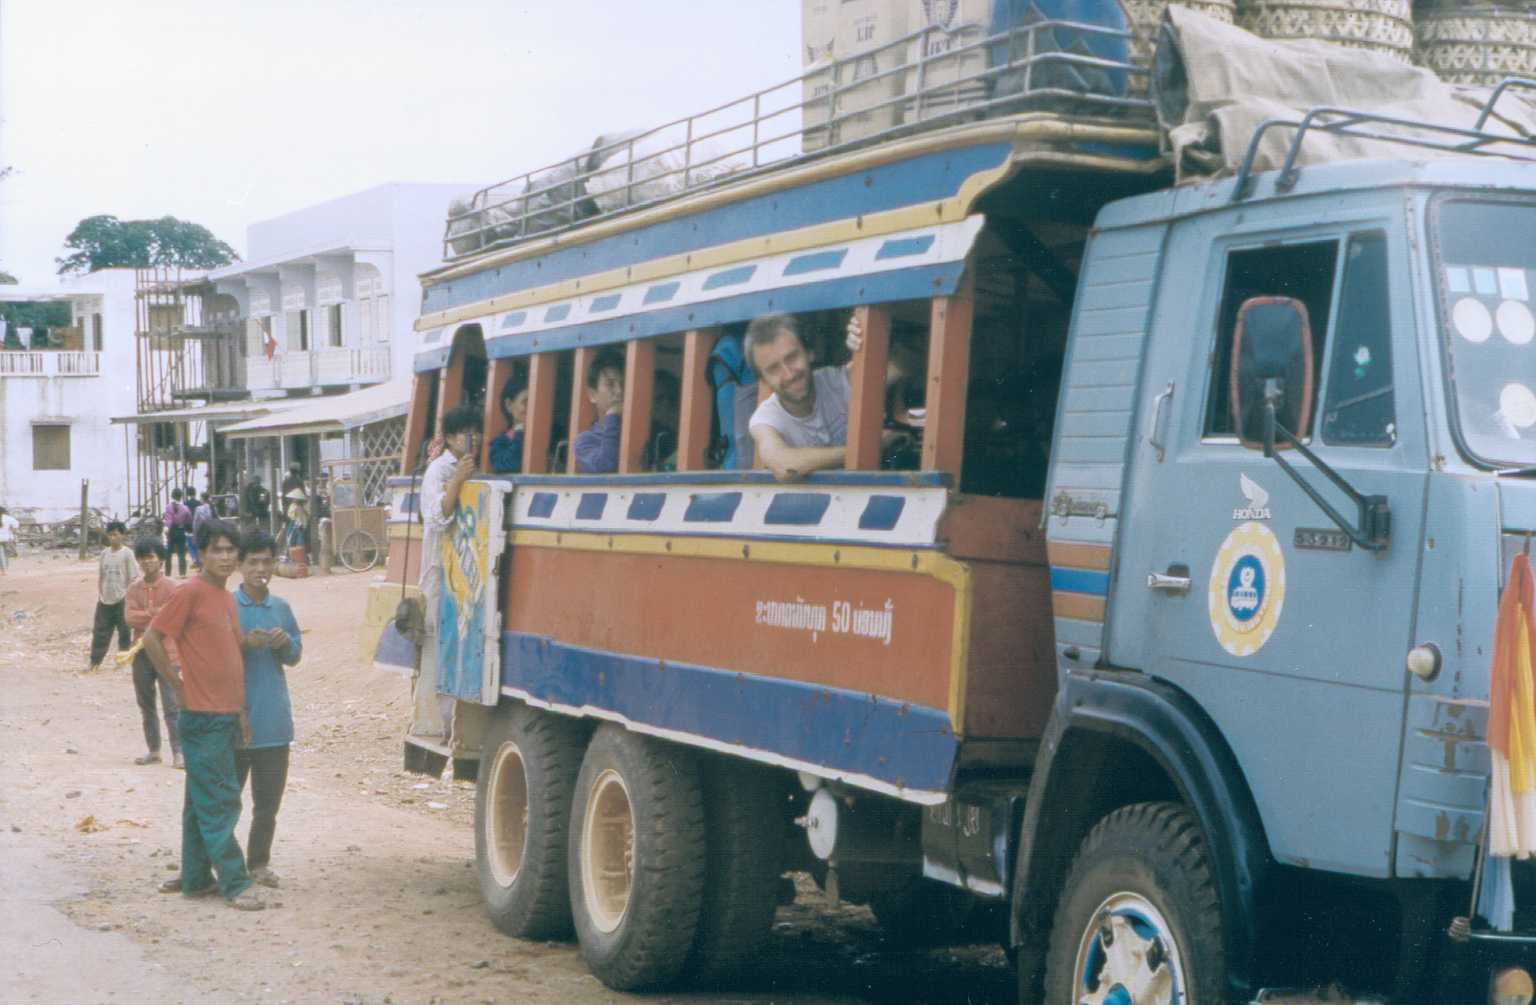 Boarding a truck-turned-bus in Laos (1994)